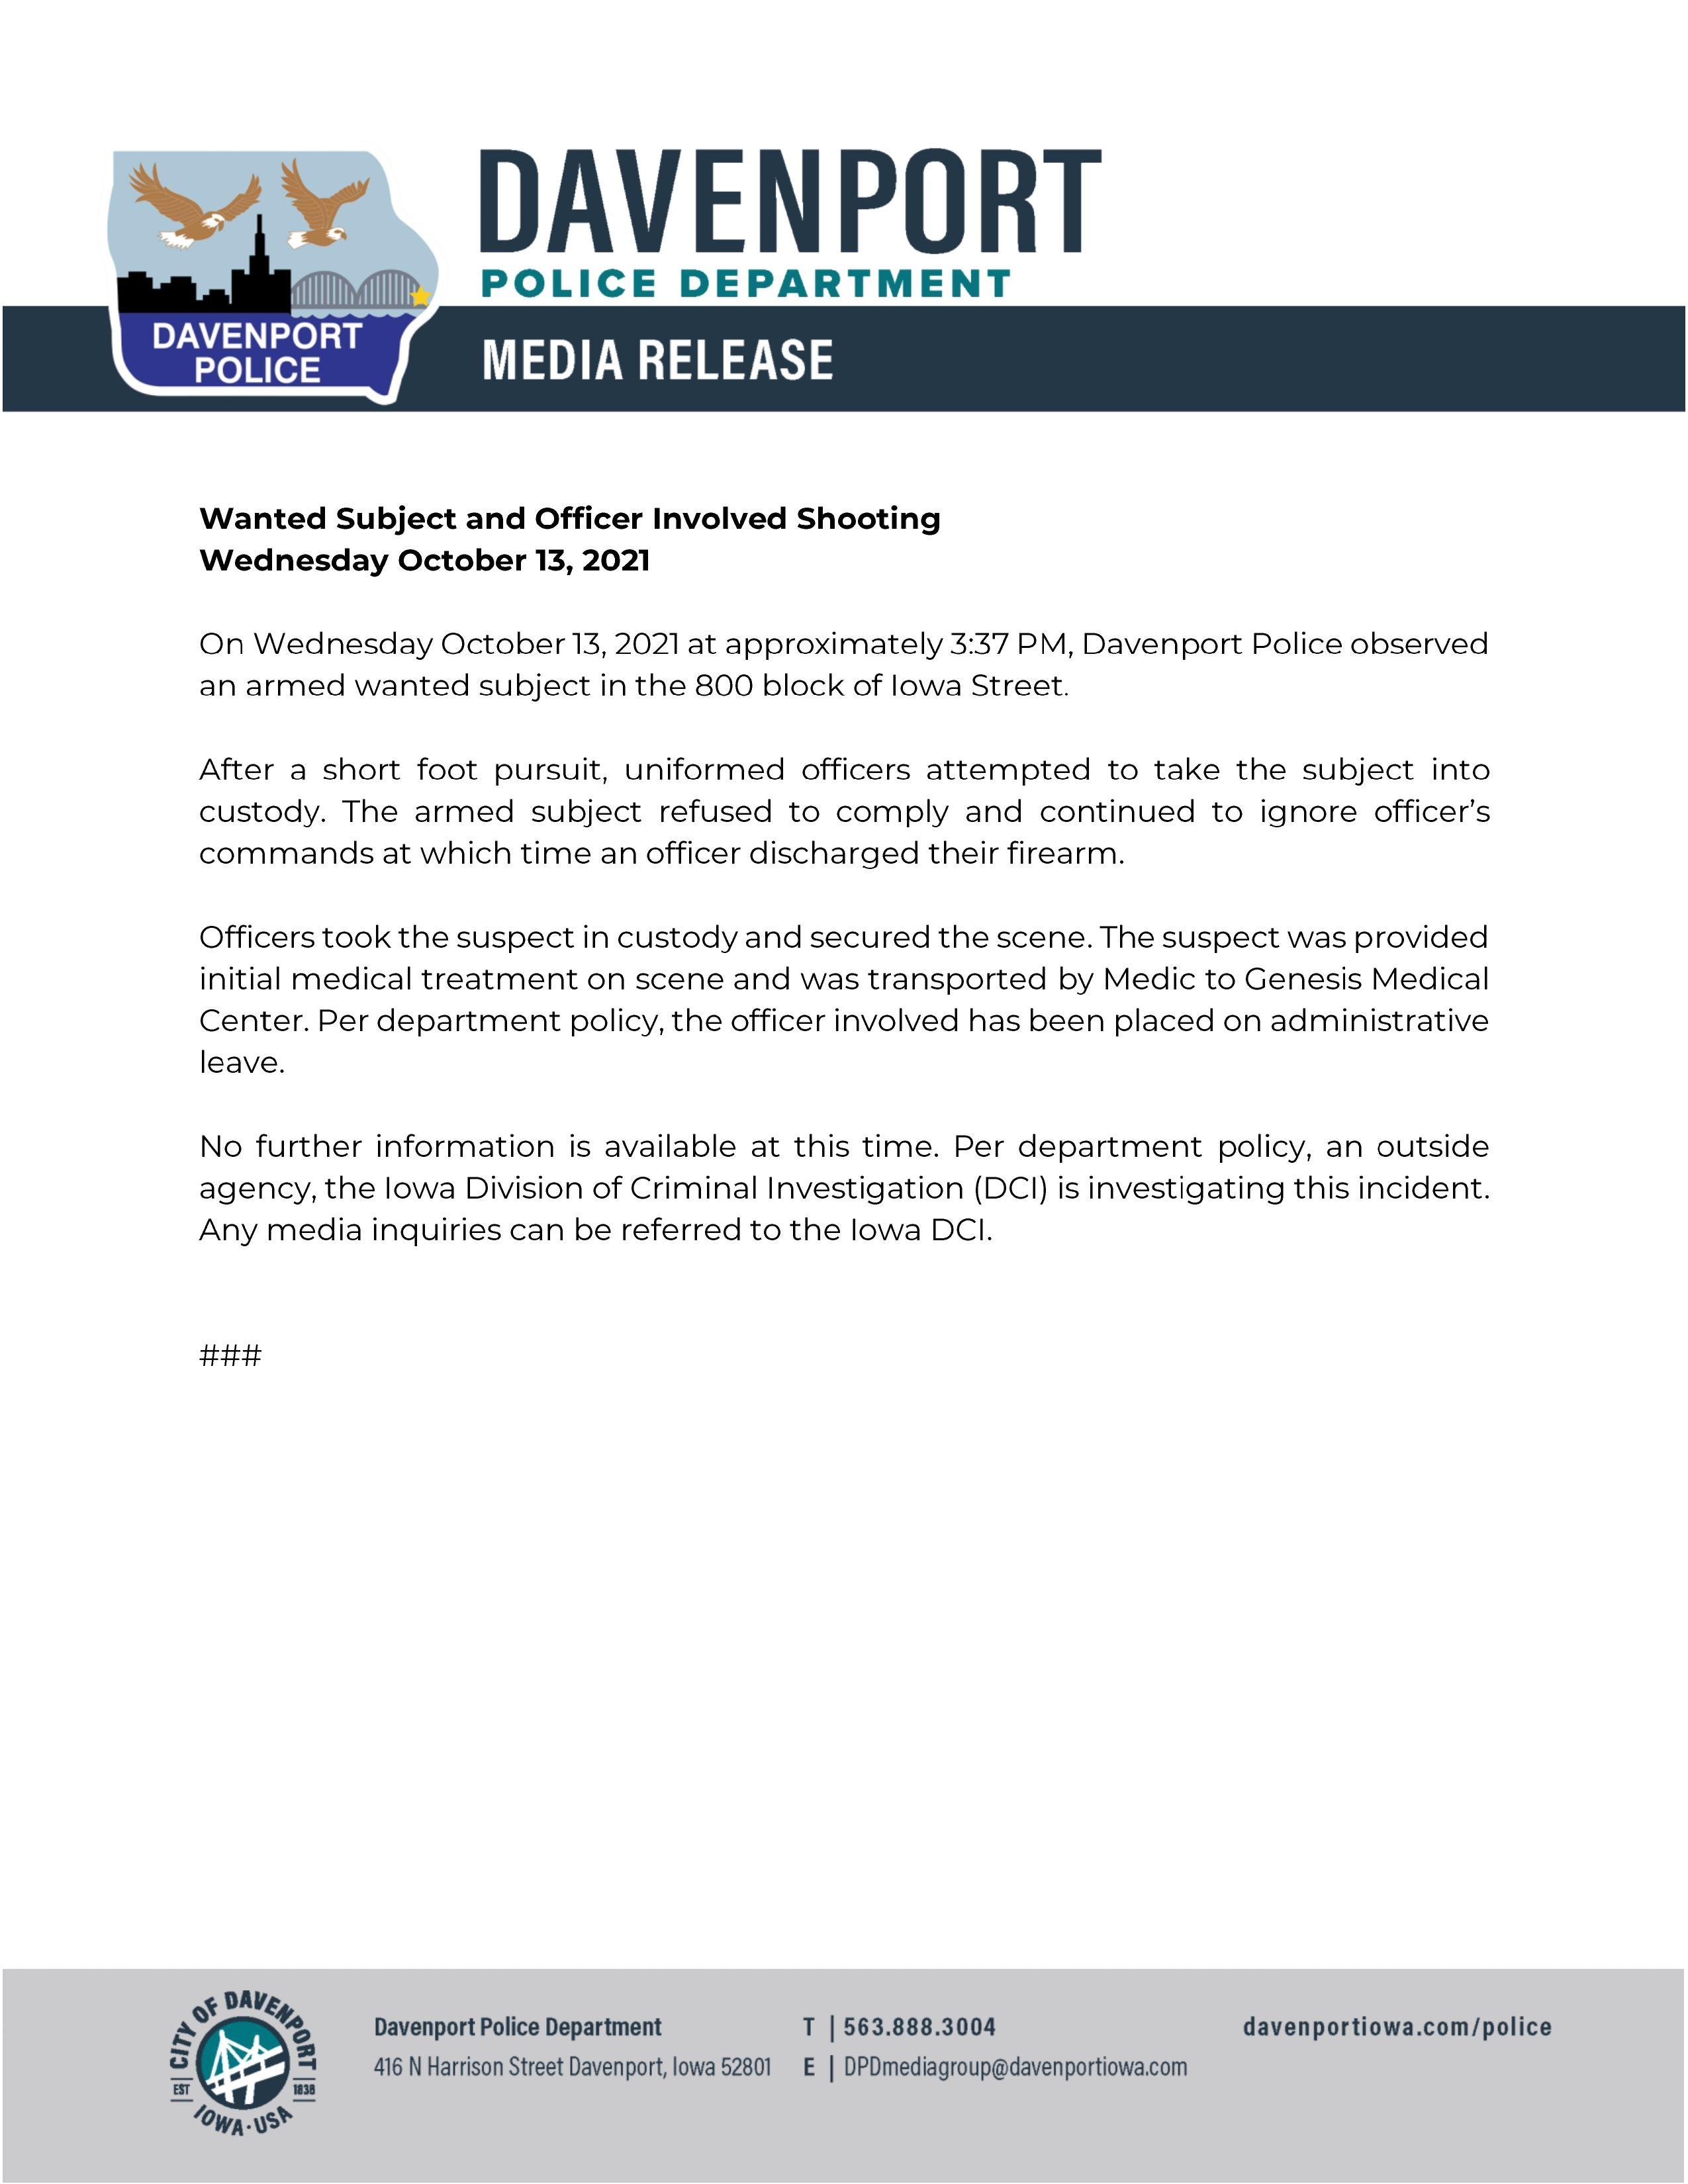 Davenport Press Release